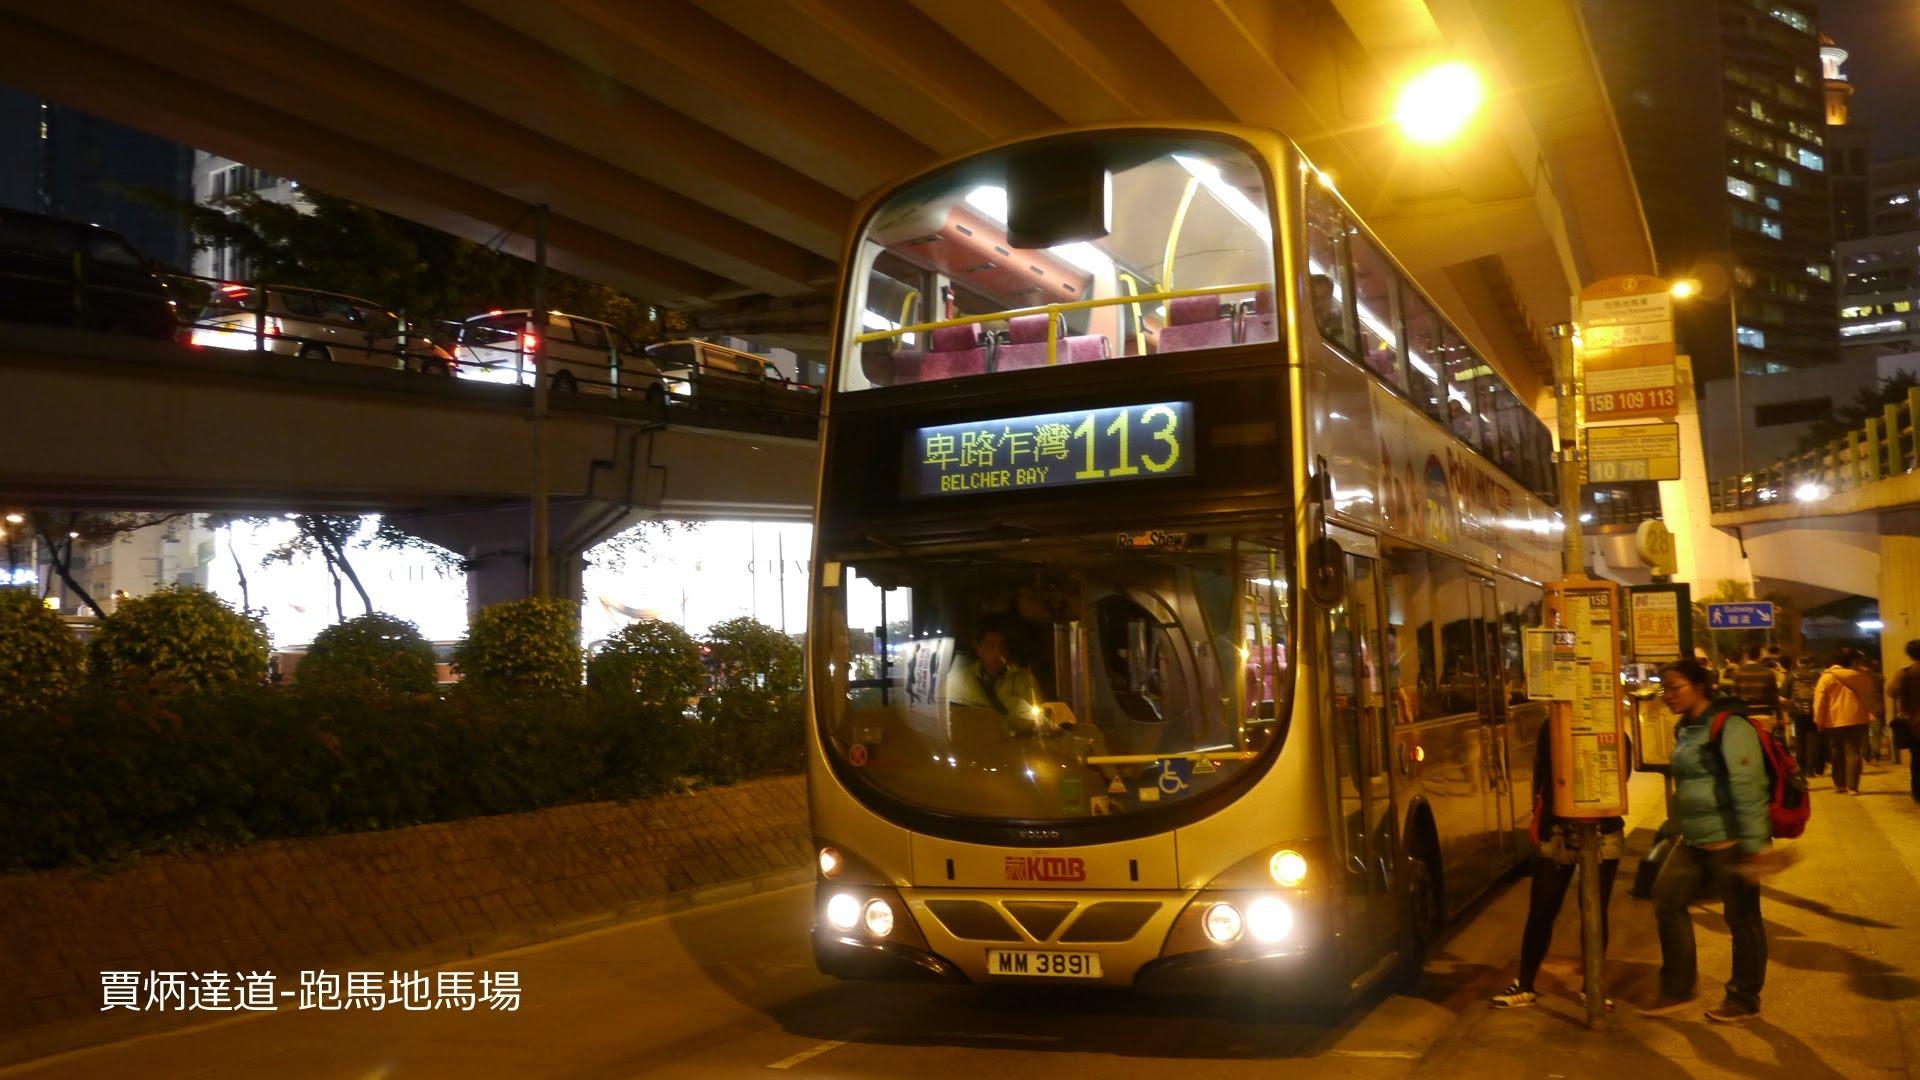 Hong Kong Bus KMB AVBW54 @ 113 九龍巴士 Volvo B9 賈炳達道-跑馬地馬場